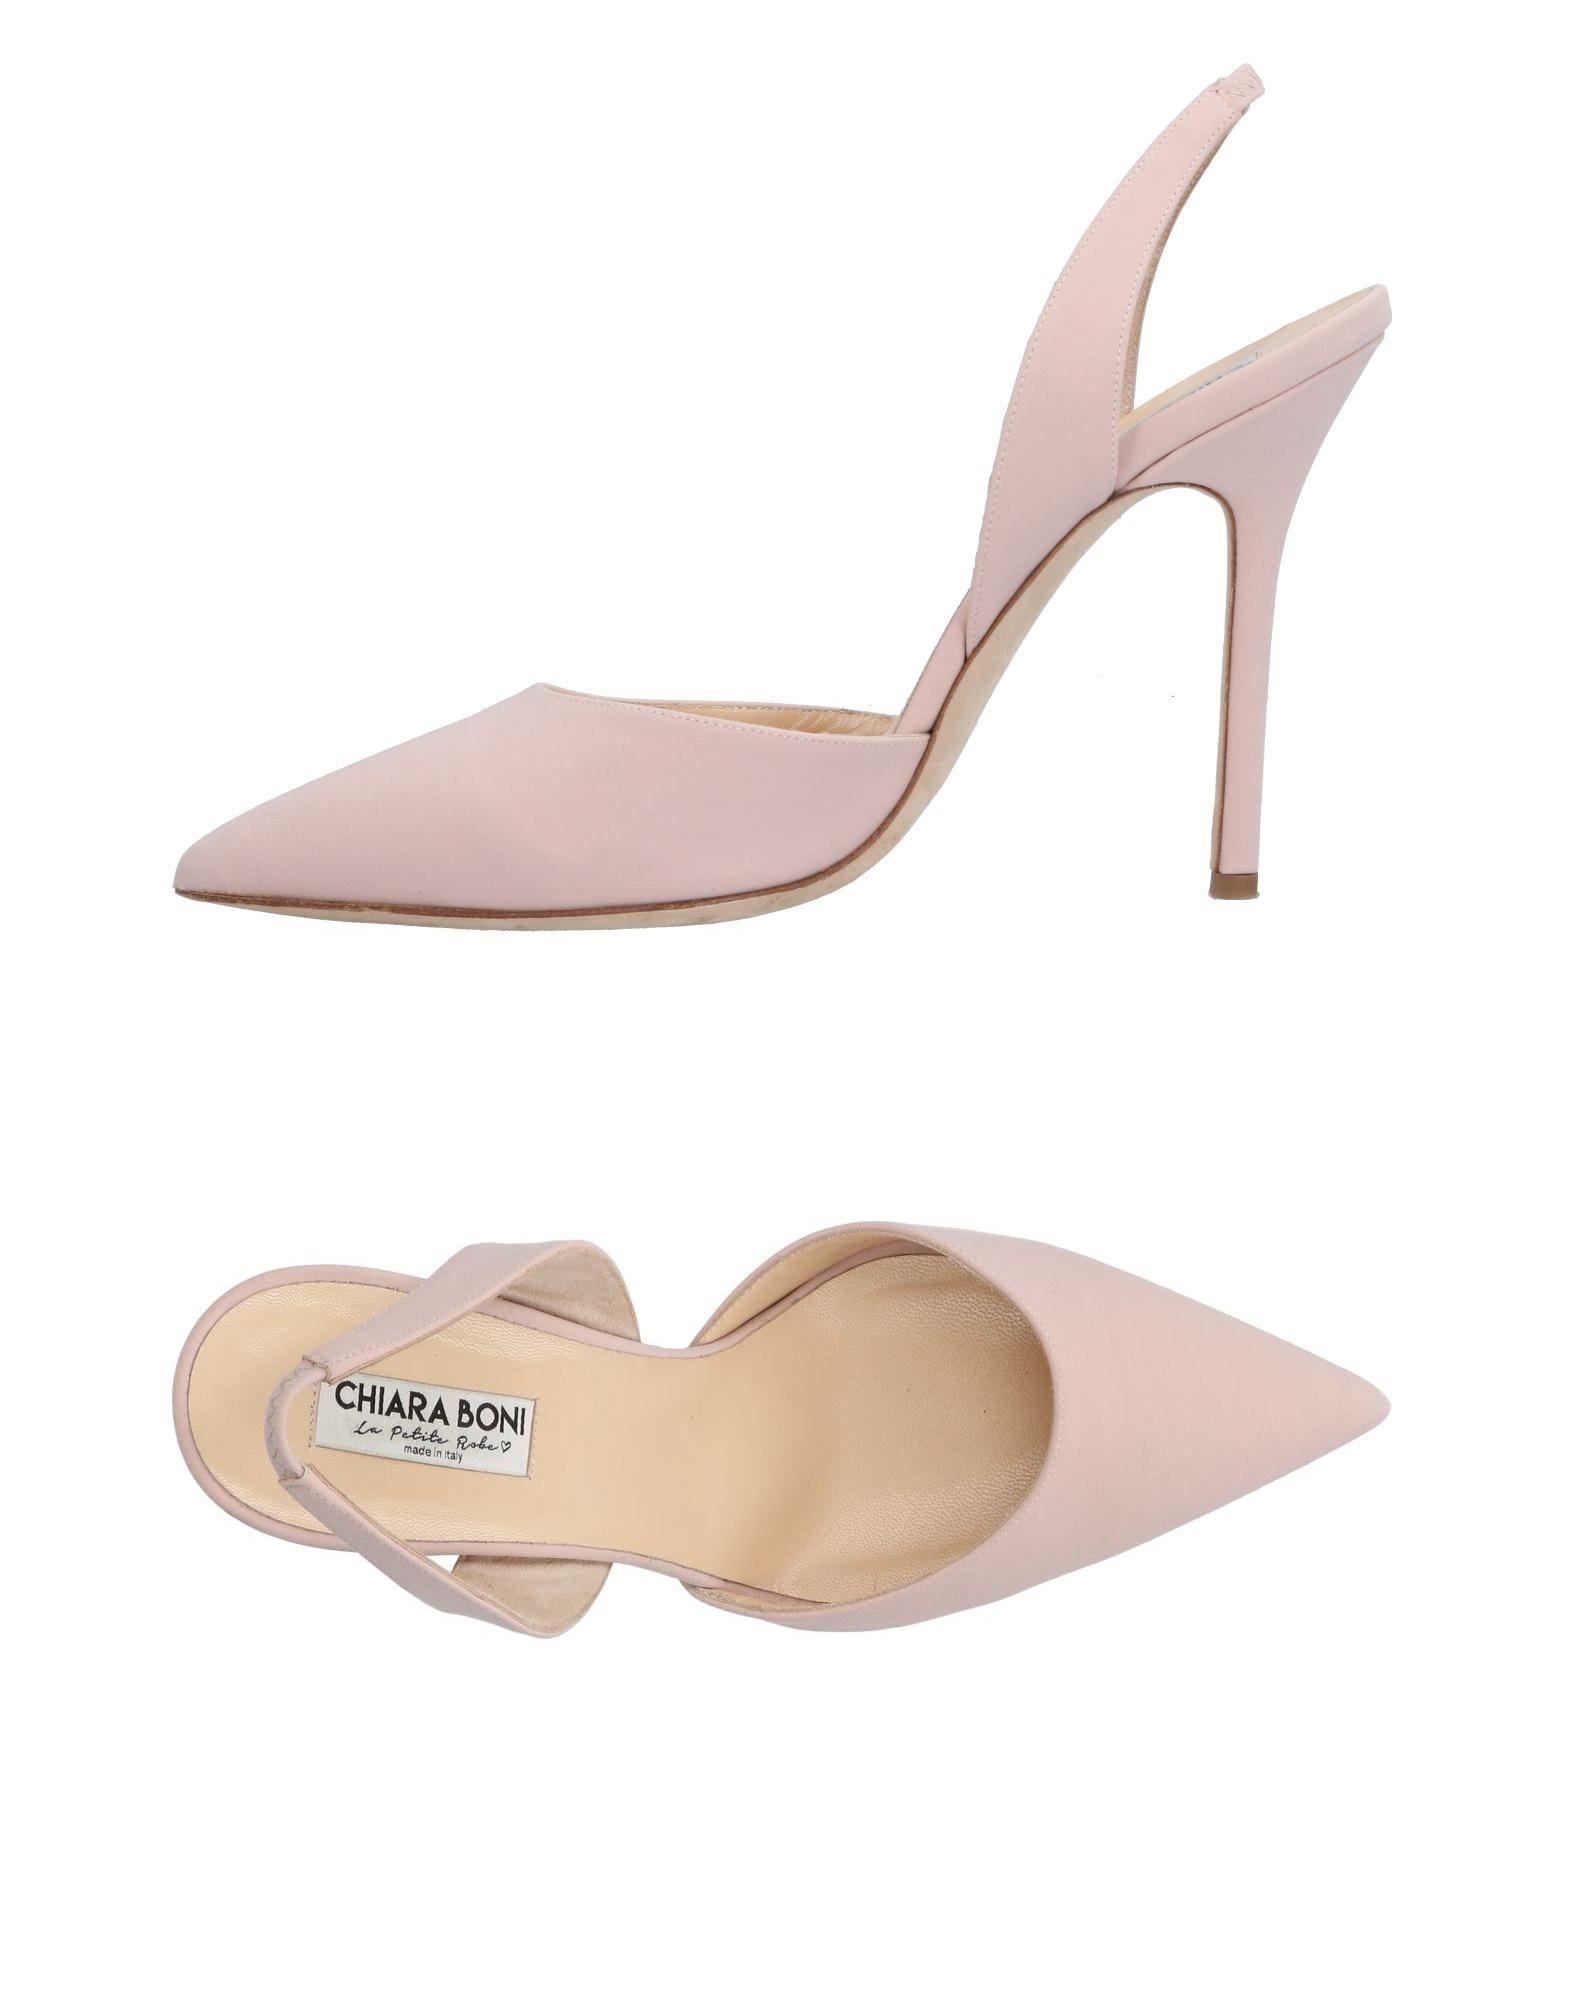 Stilvolle billige Schuhe Chiara Boni La Petite Robe Pumps Damen  11500527QF